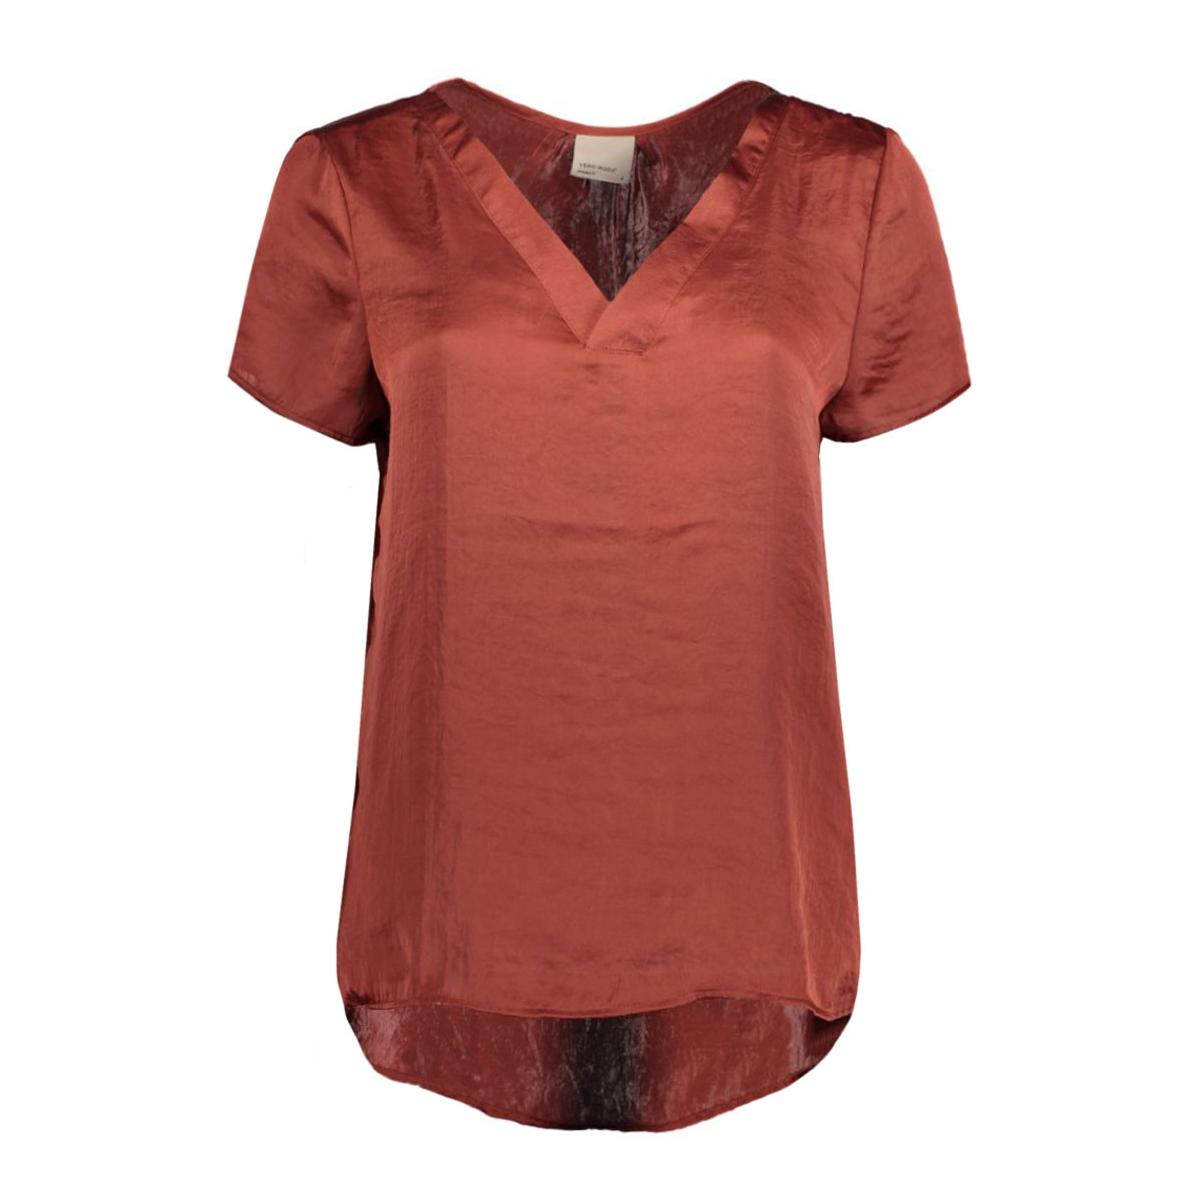 vmhammer cap sleeve midi top a 10165228 vero moda t-shirt fired brick